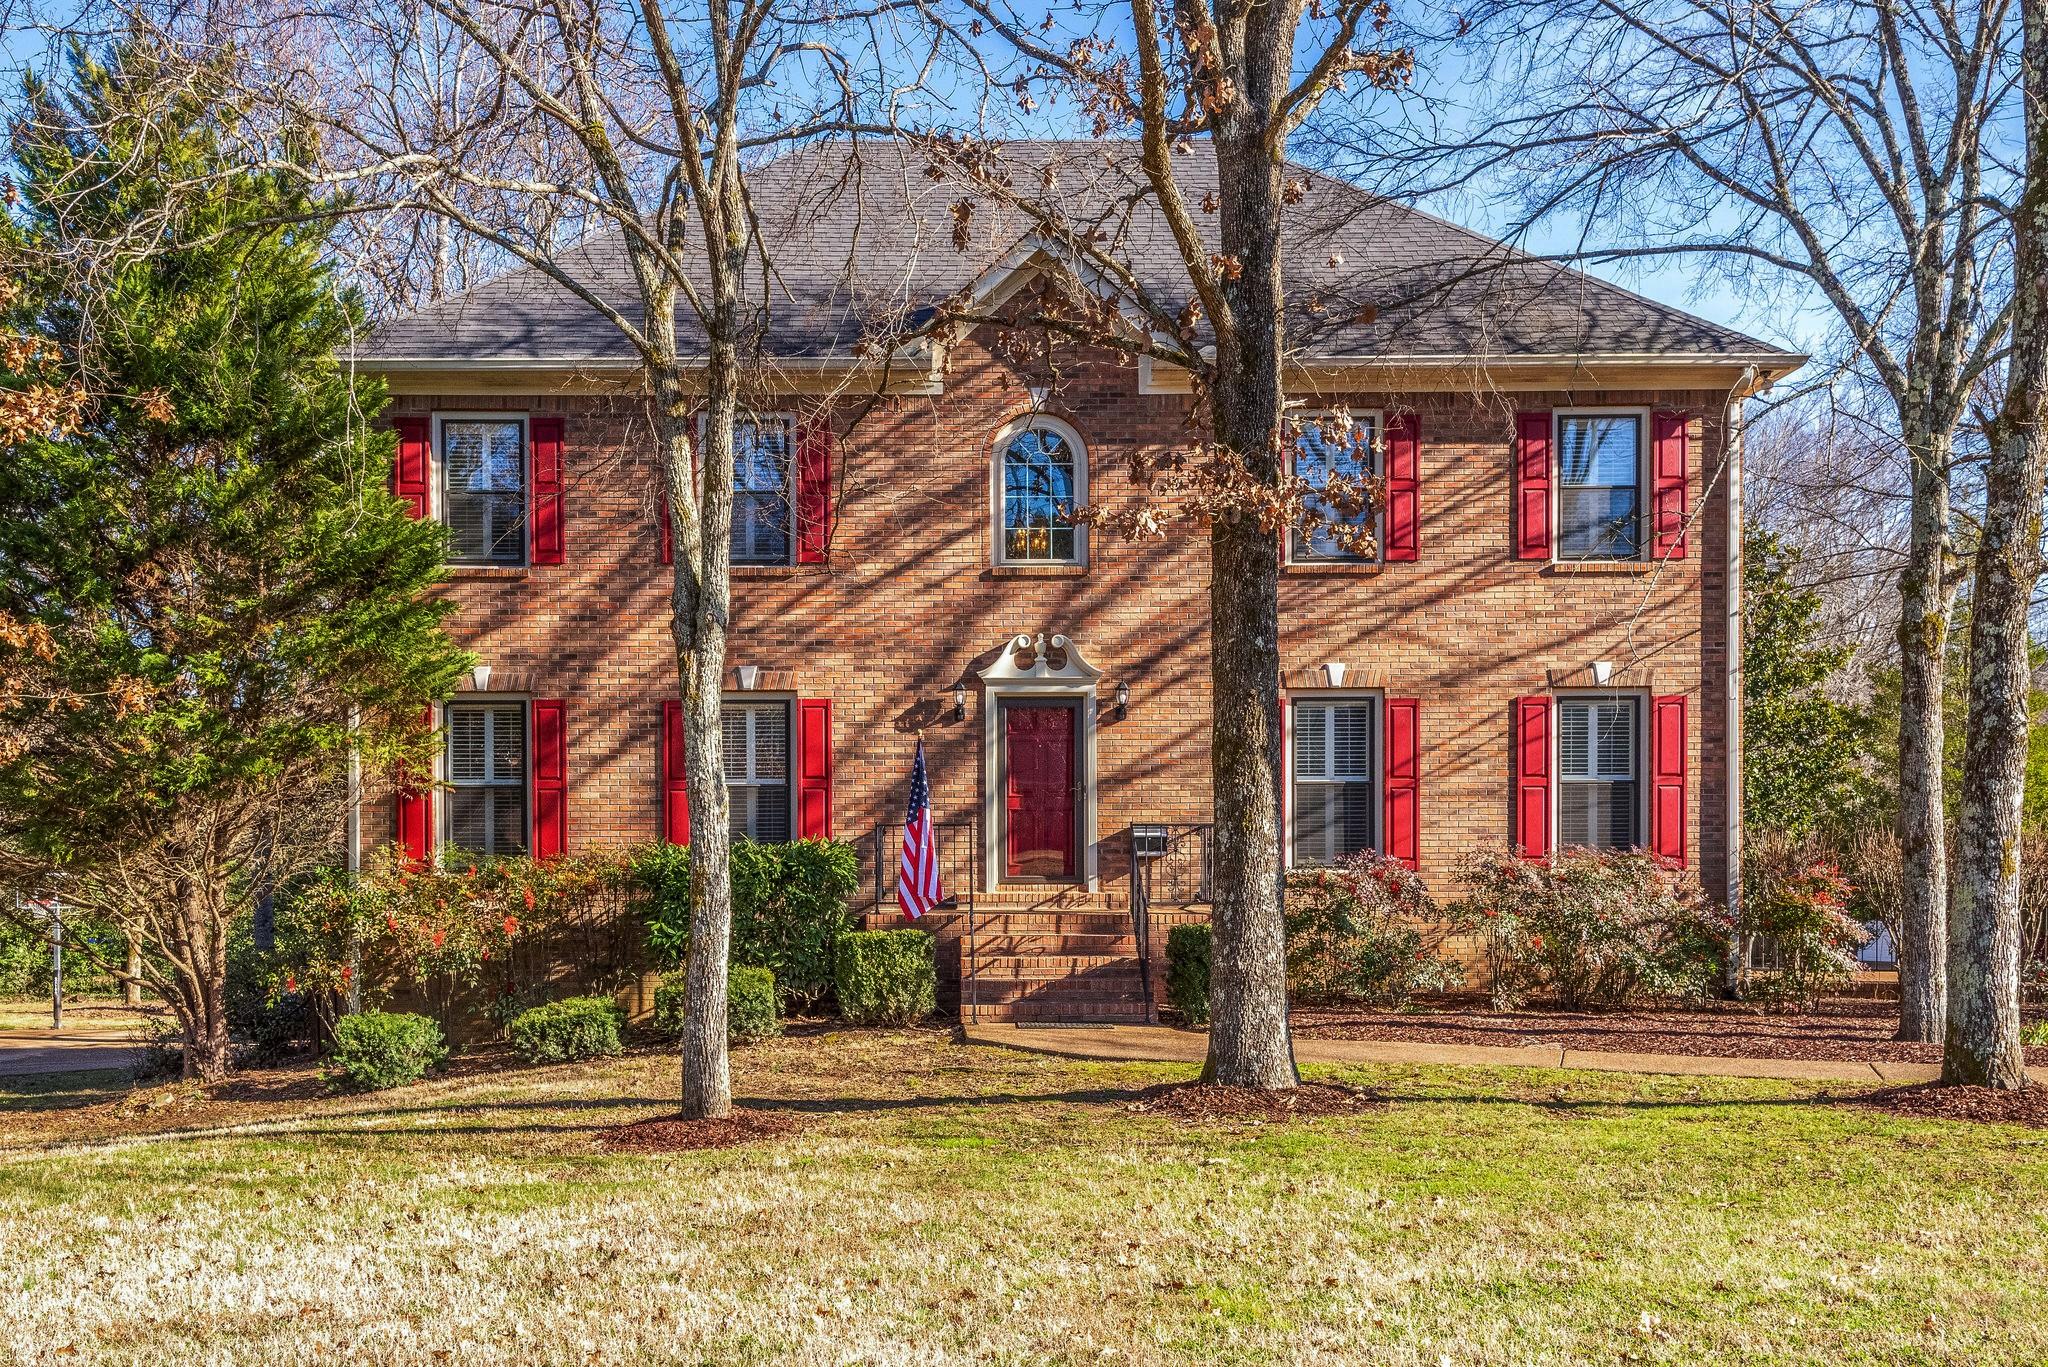 414 Ashley Ln, Kingston Springs, TN 37082 - Kingston Springs, TN real estate listing